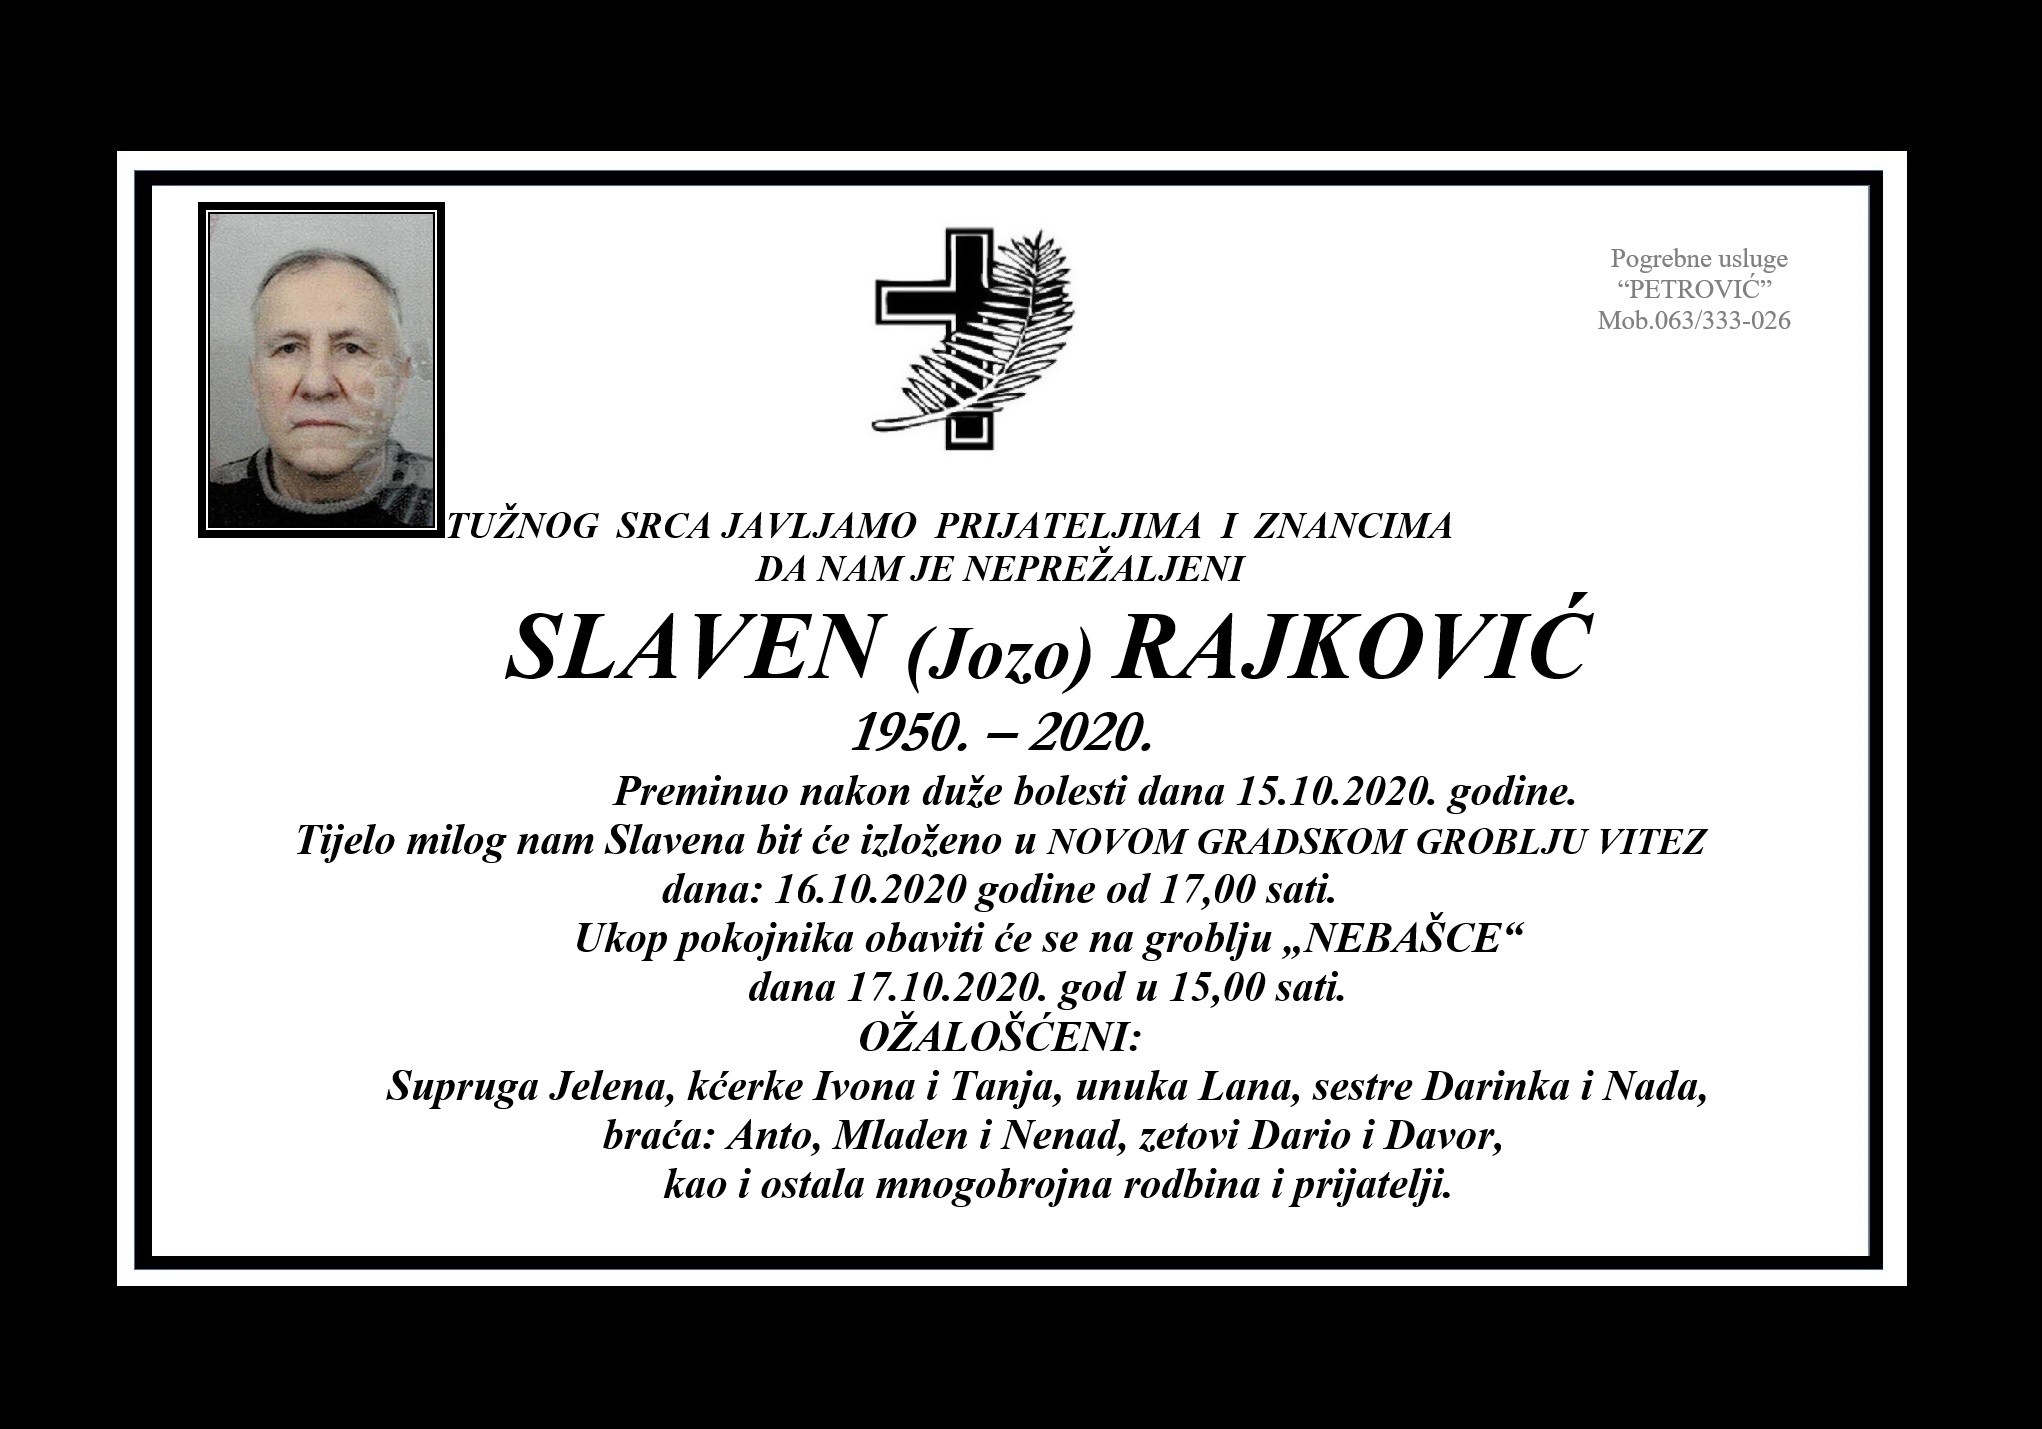 Slaven (Jozo) Rajković